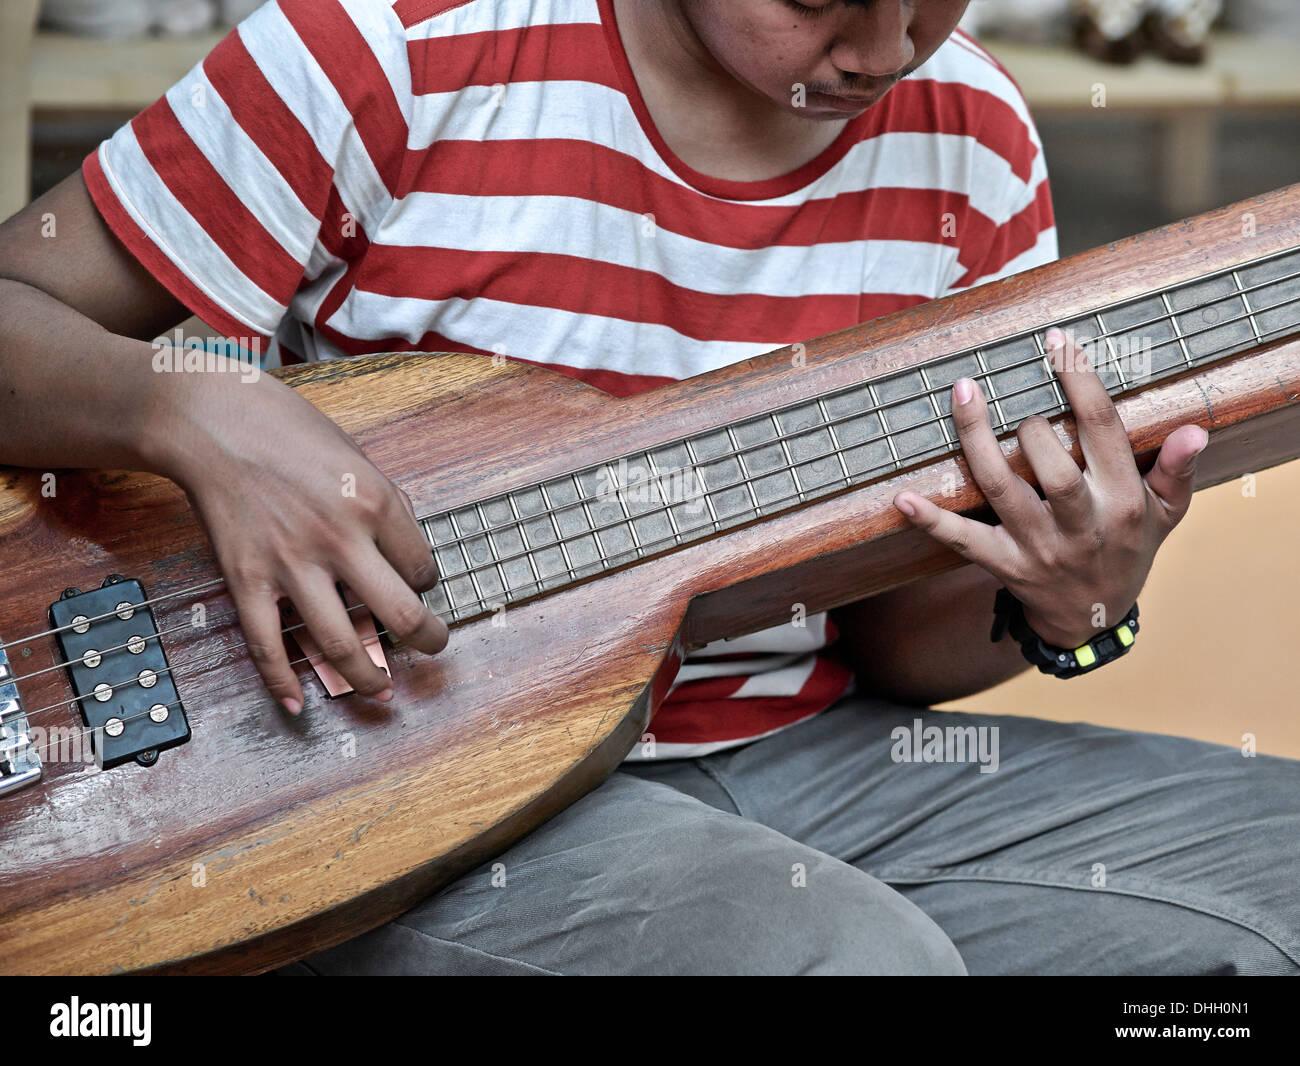 Musical Instrument Stock Photos & Musical Instrument Stock